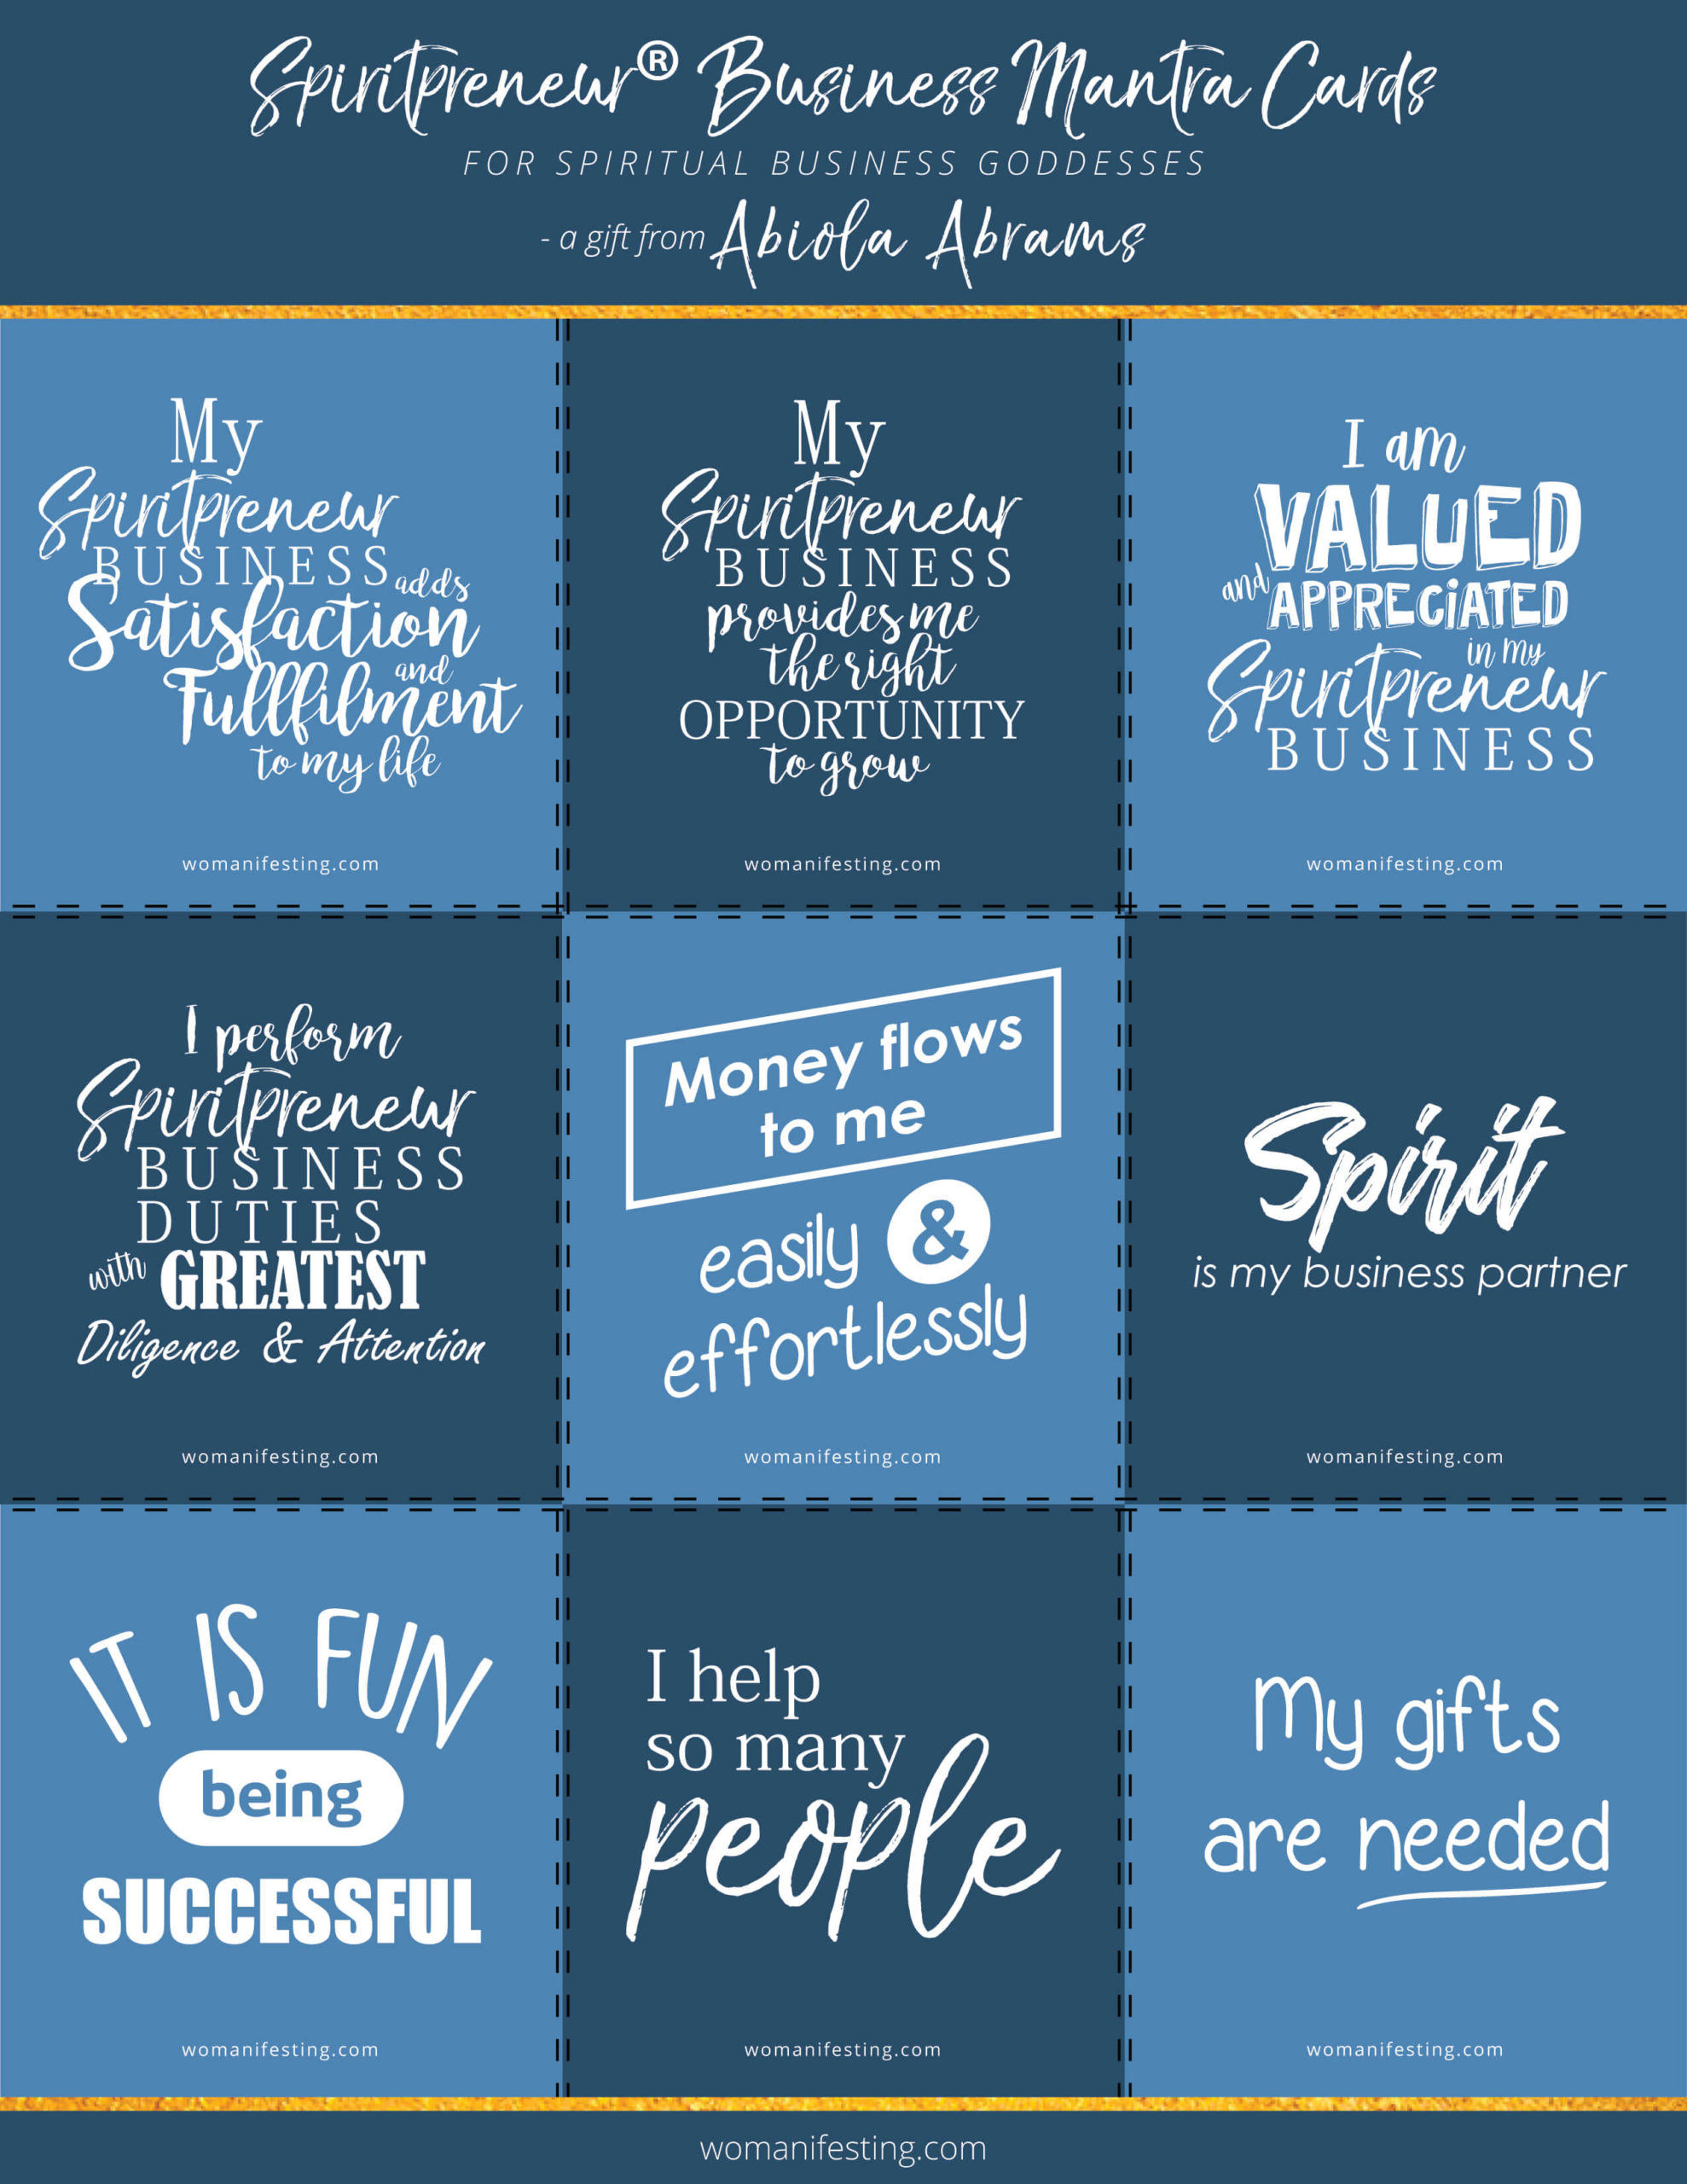 Spiritpreneur Business Mantra Affirmation Cards [Infographic]